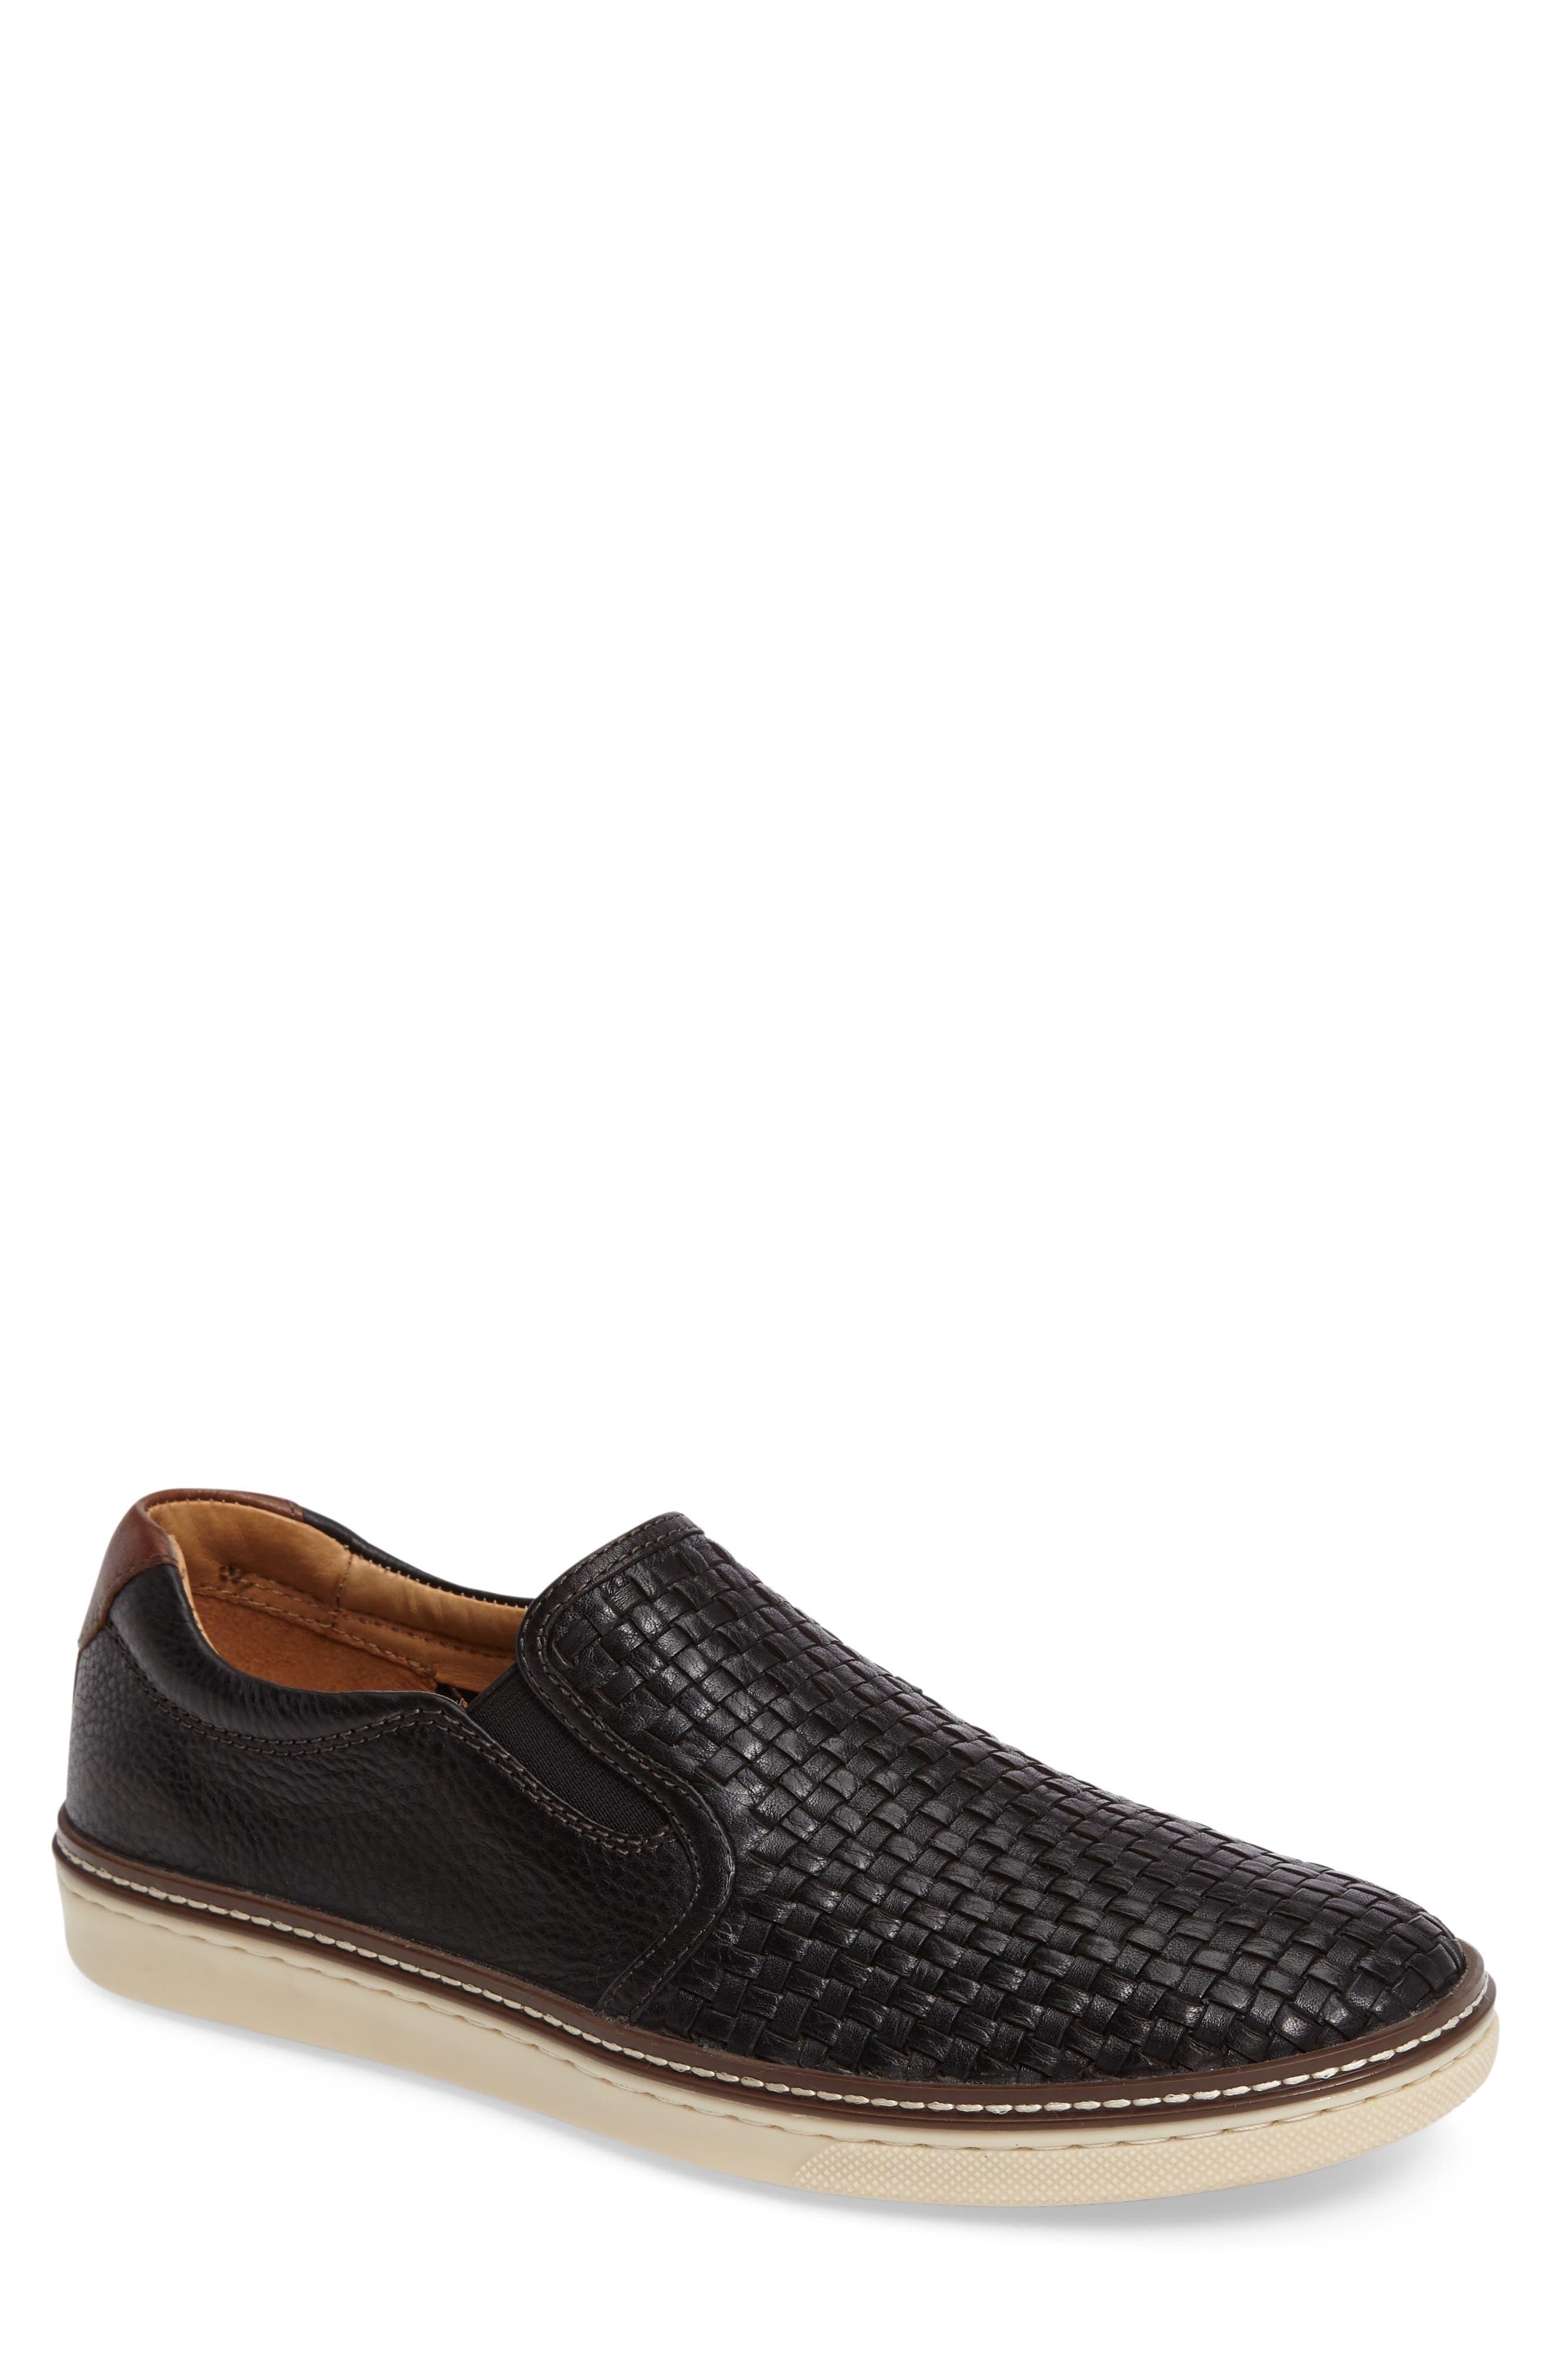 McGuffey Woven Slip-On Sneaker,                         Main,                         color, BLACK LEATHER